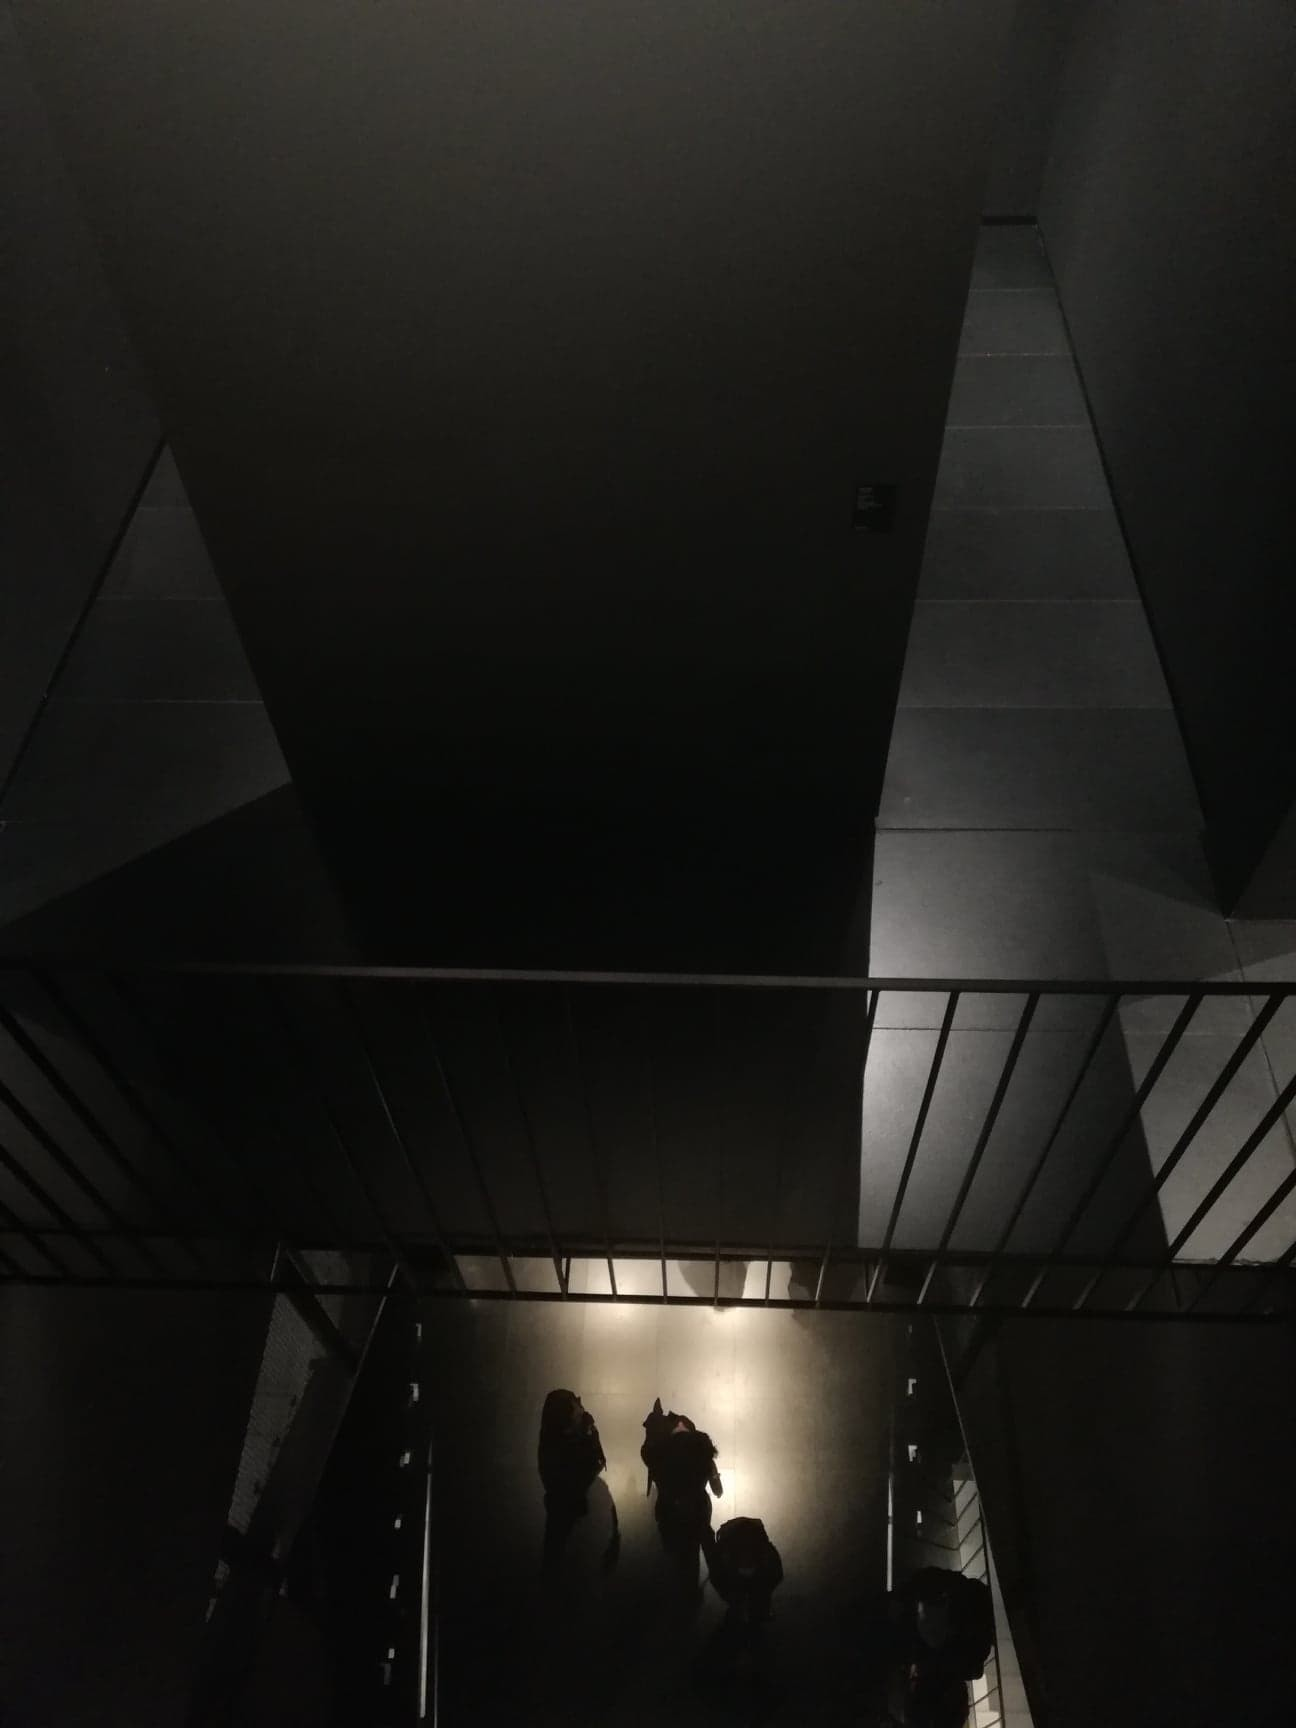 contemporary-art-museum-c466088601d5093d